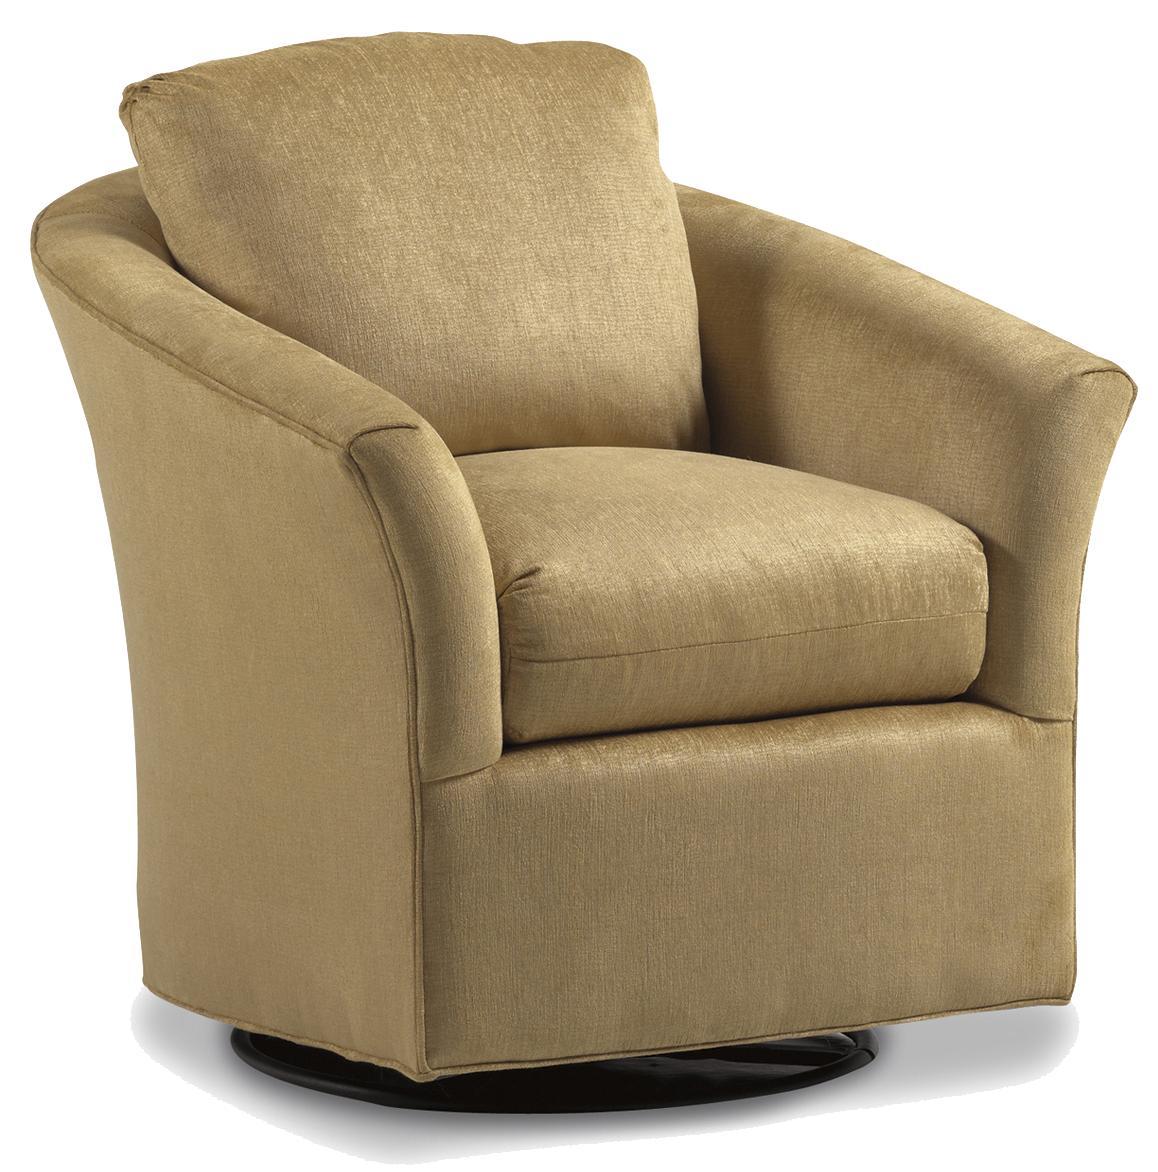 Jessica Charles Fine Upholstered Accents Payne Upholstered Swivel Glider